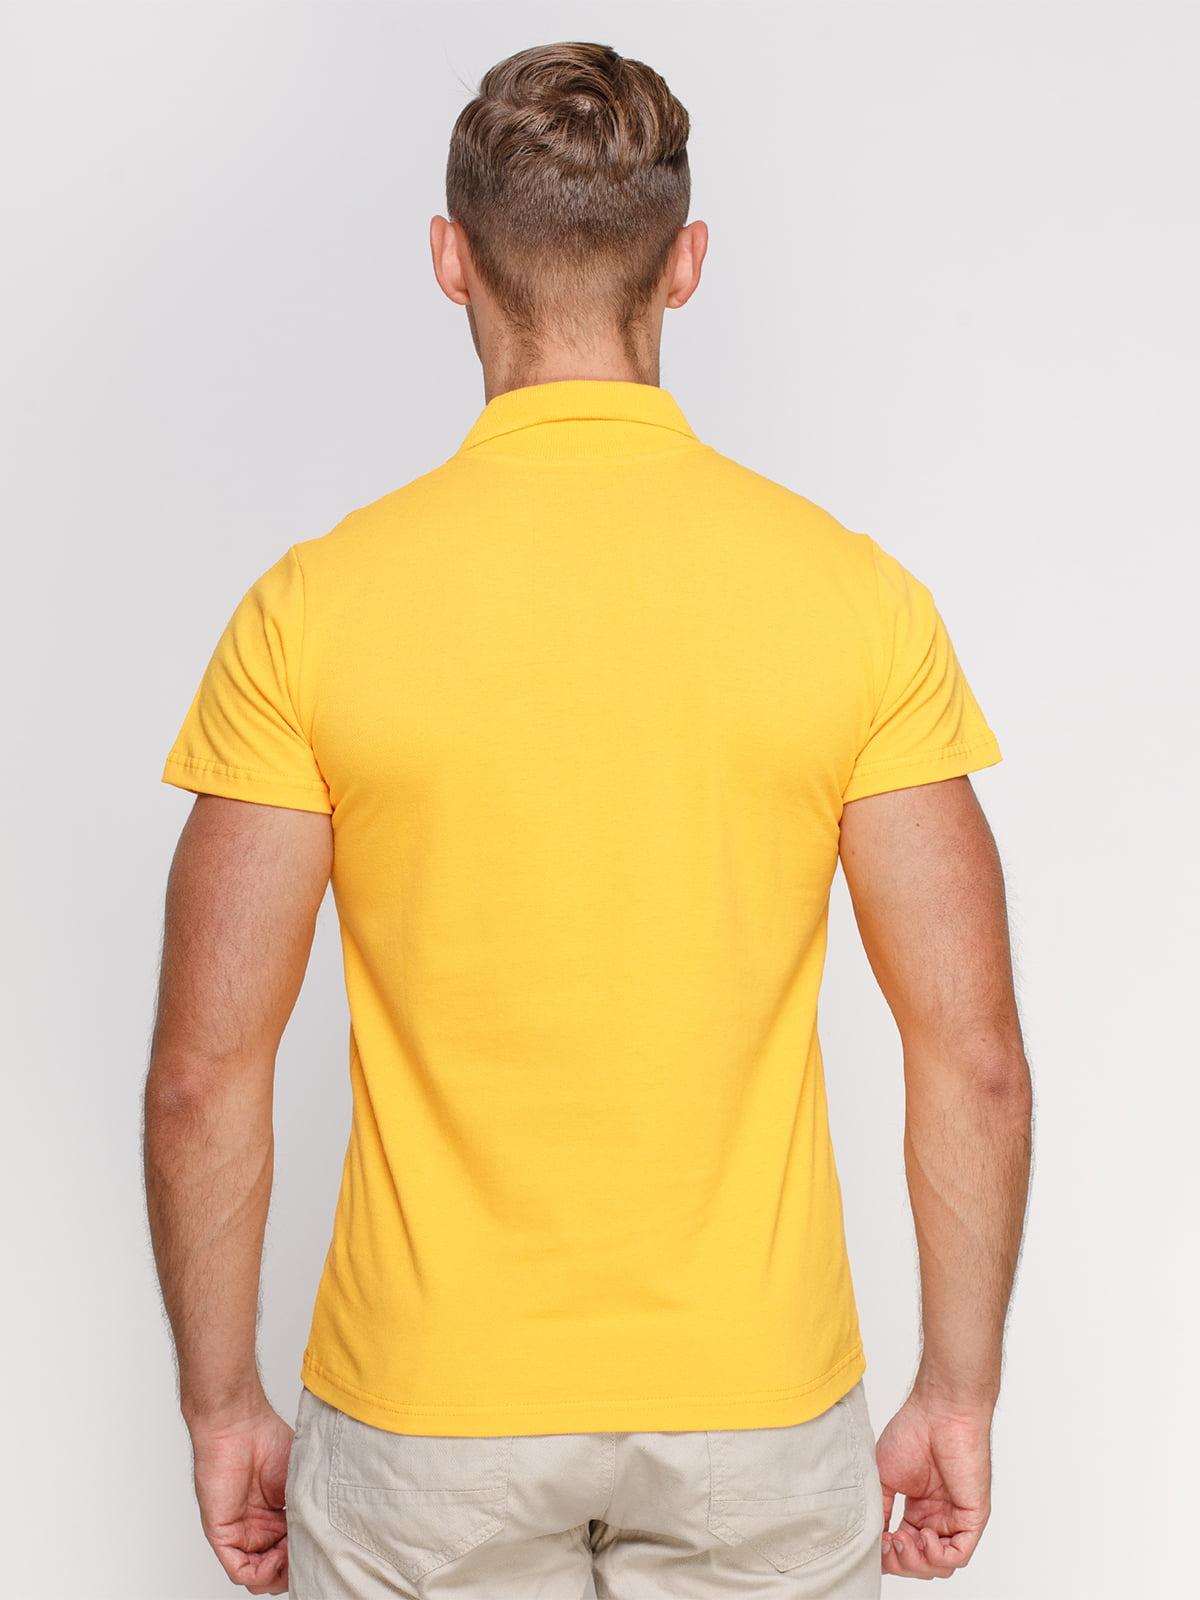 Футболка-поло жовта | 4768981 | фото 2